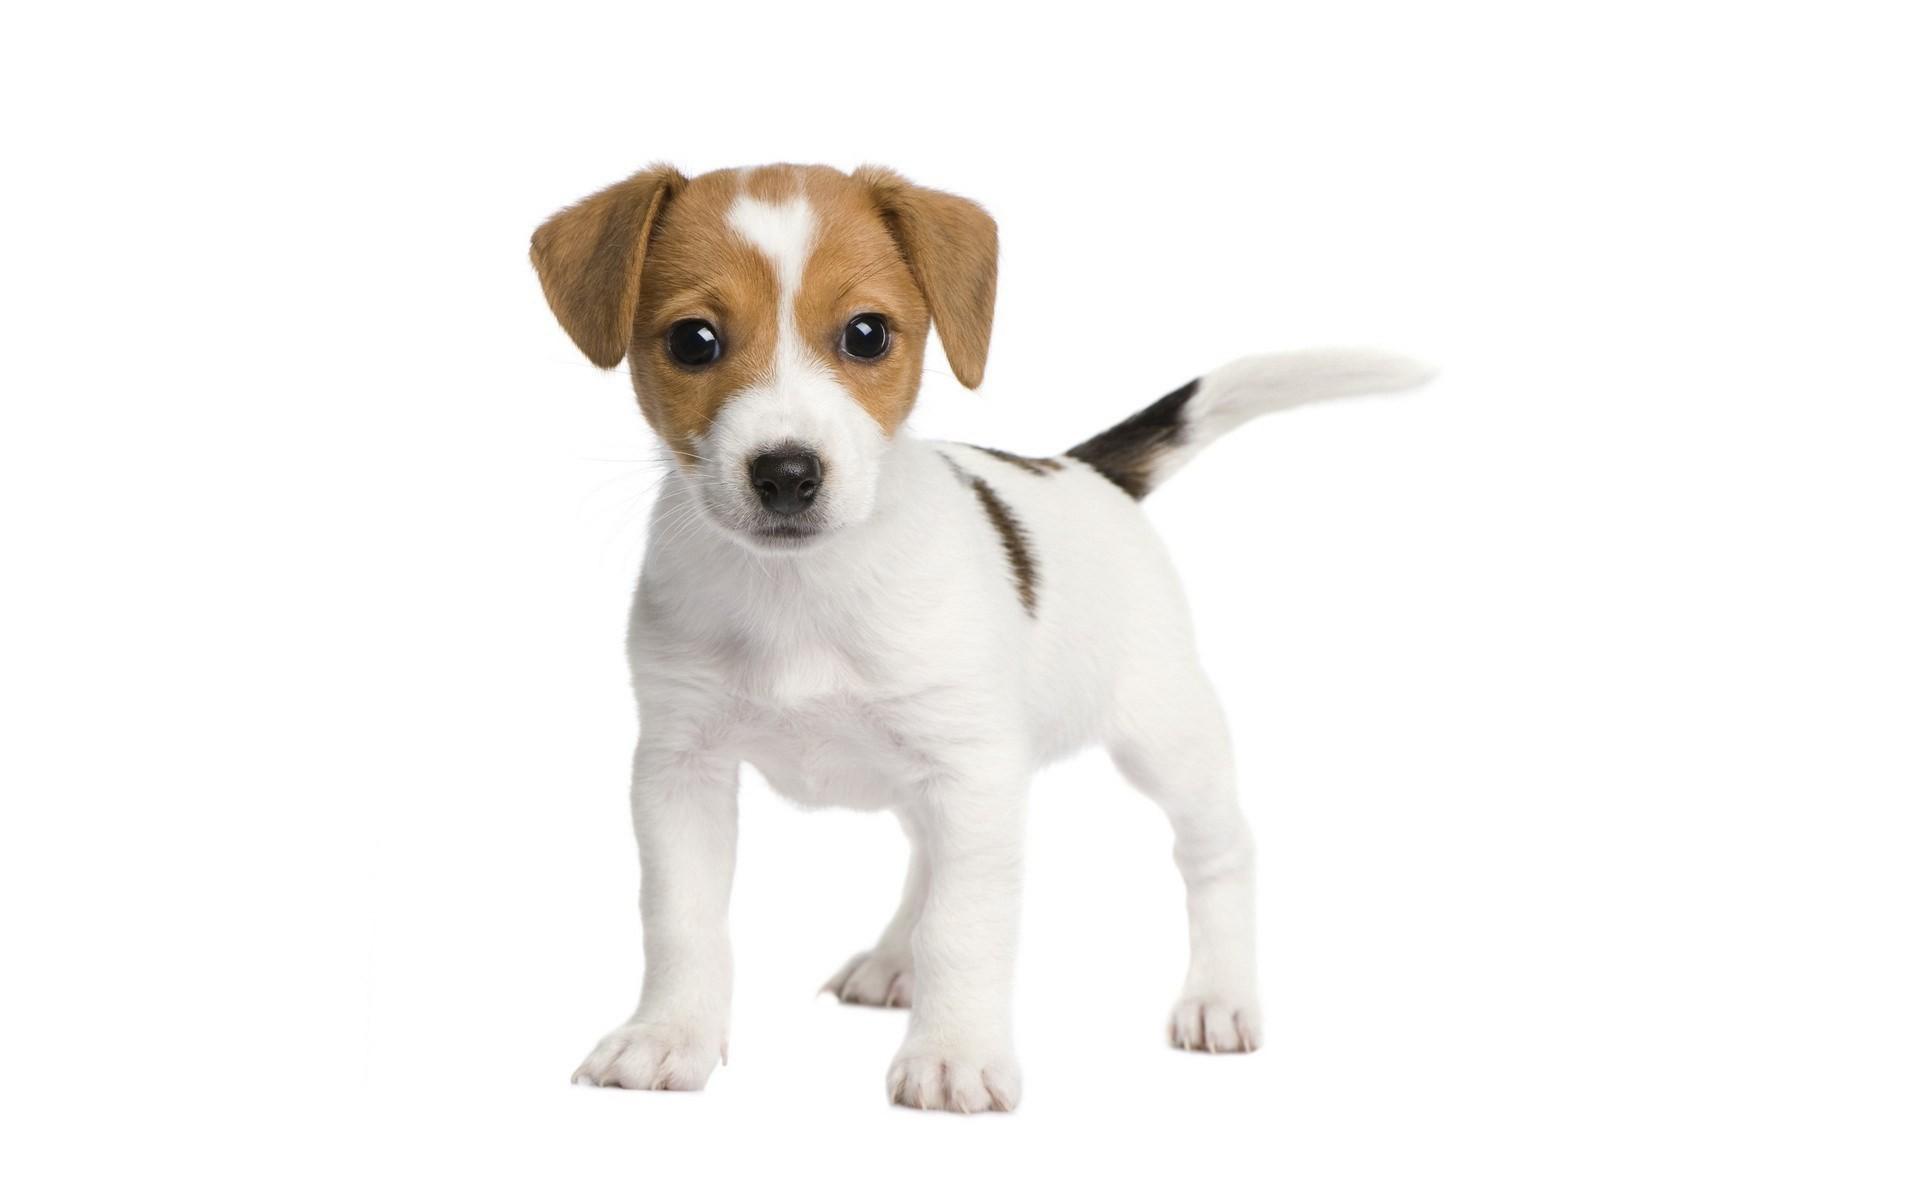 puppy desktop wallpaper free